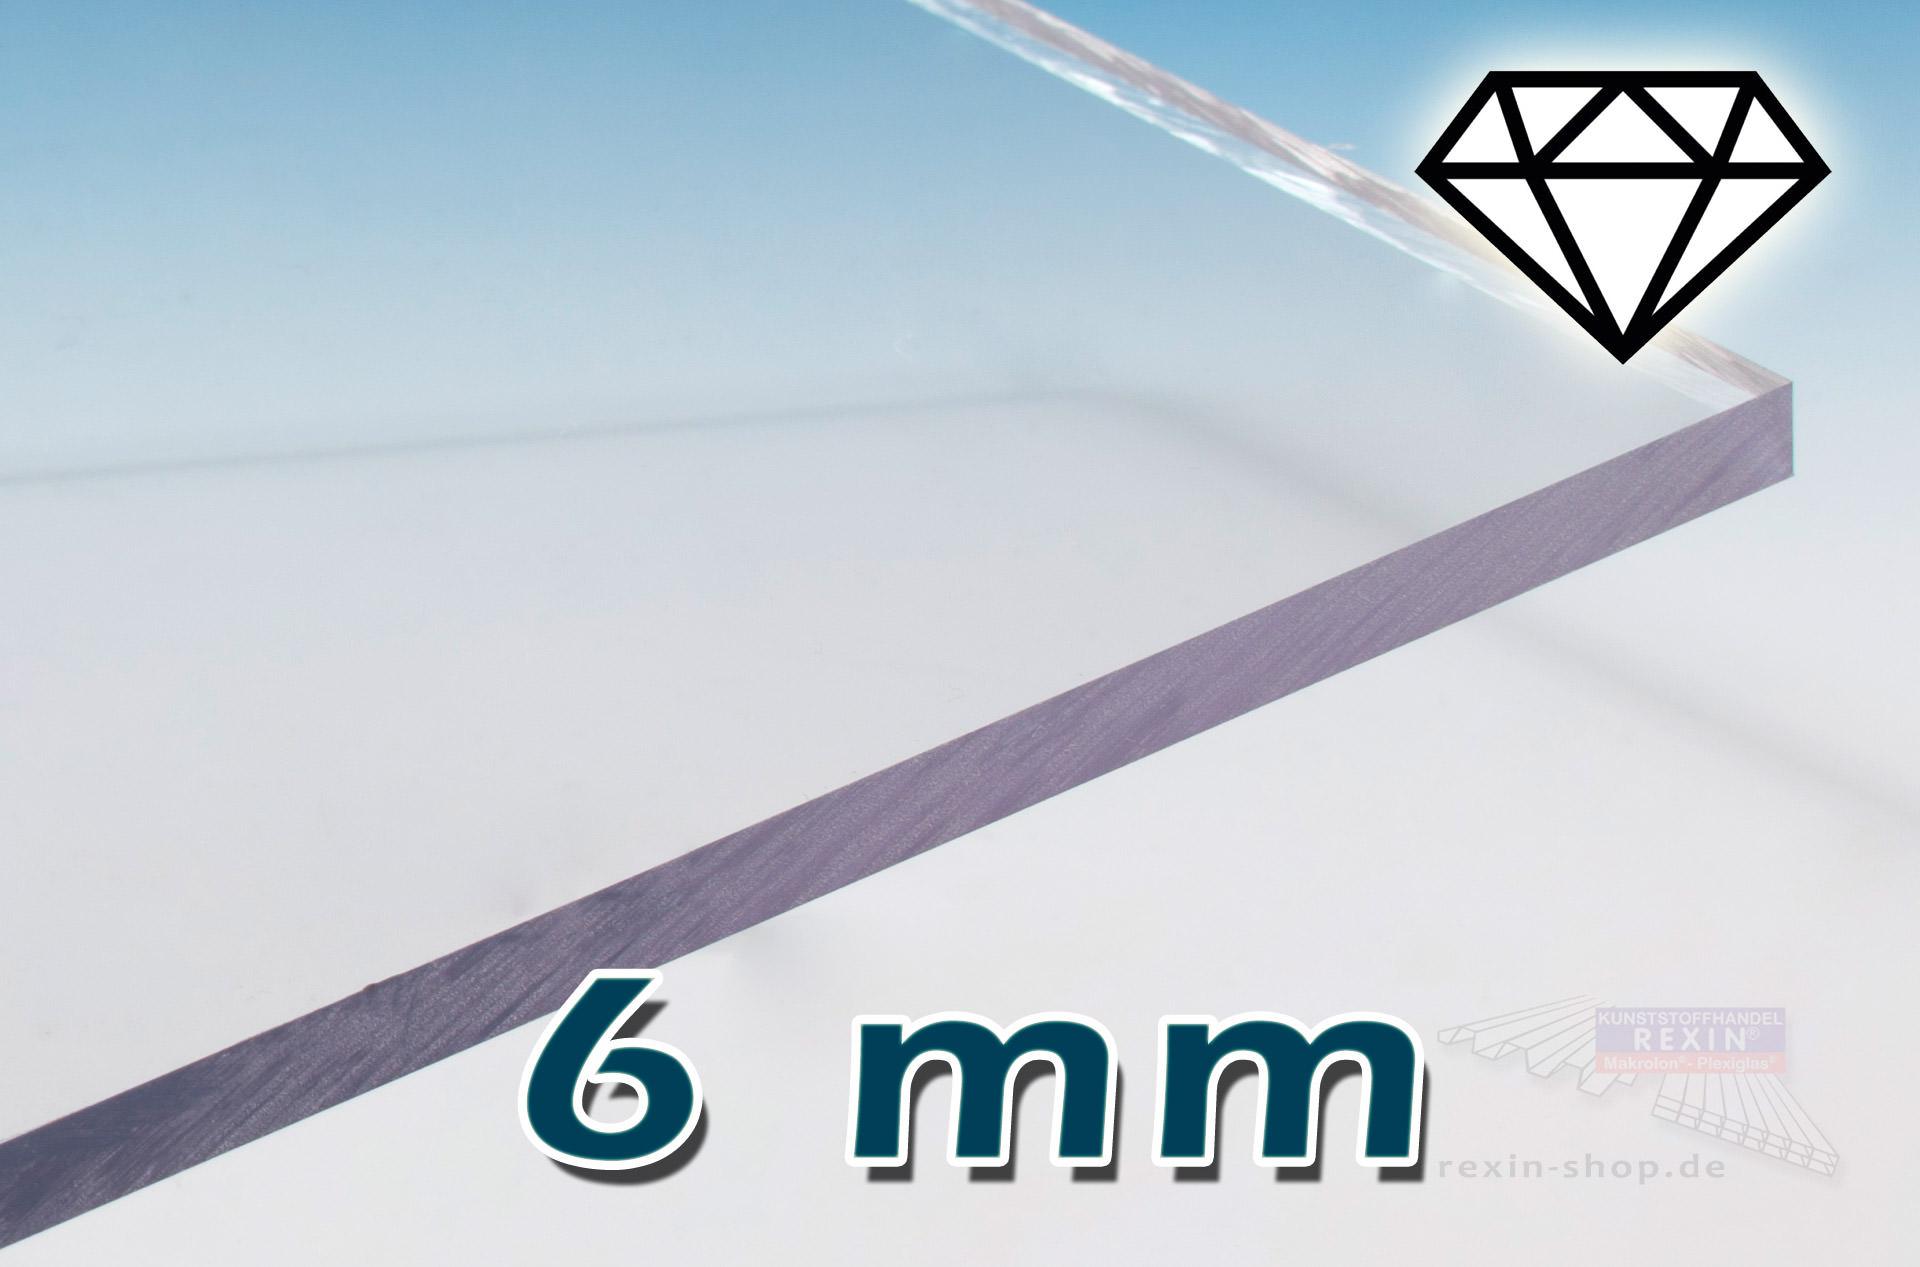 saphir uv 6mm massivplatte klar kratzfest saphir uv 6mm massivplatte klar kratzfest rexin shop. Black Bedroom Furniture Sets. Home Design Ideas